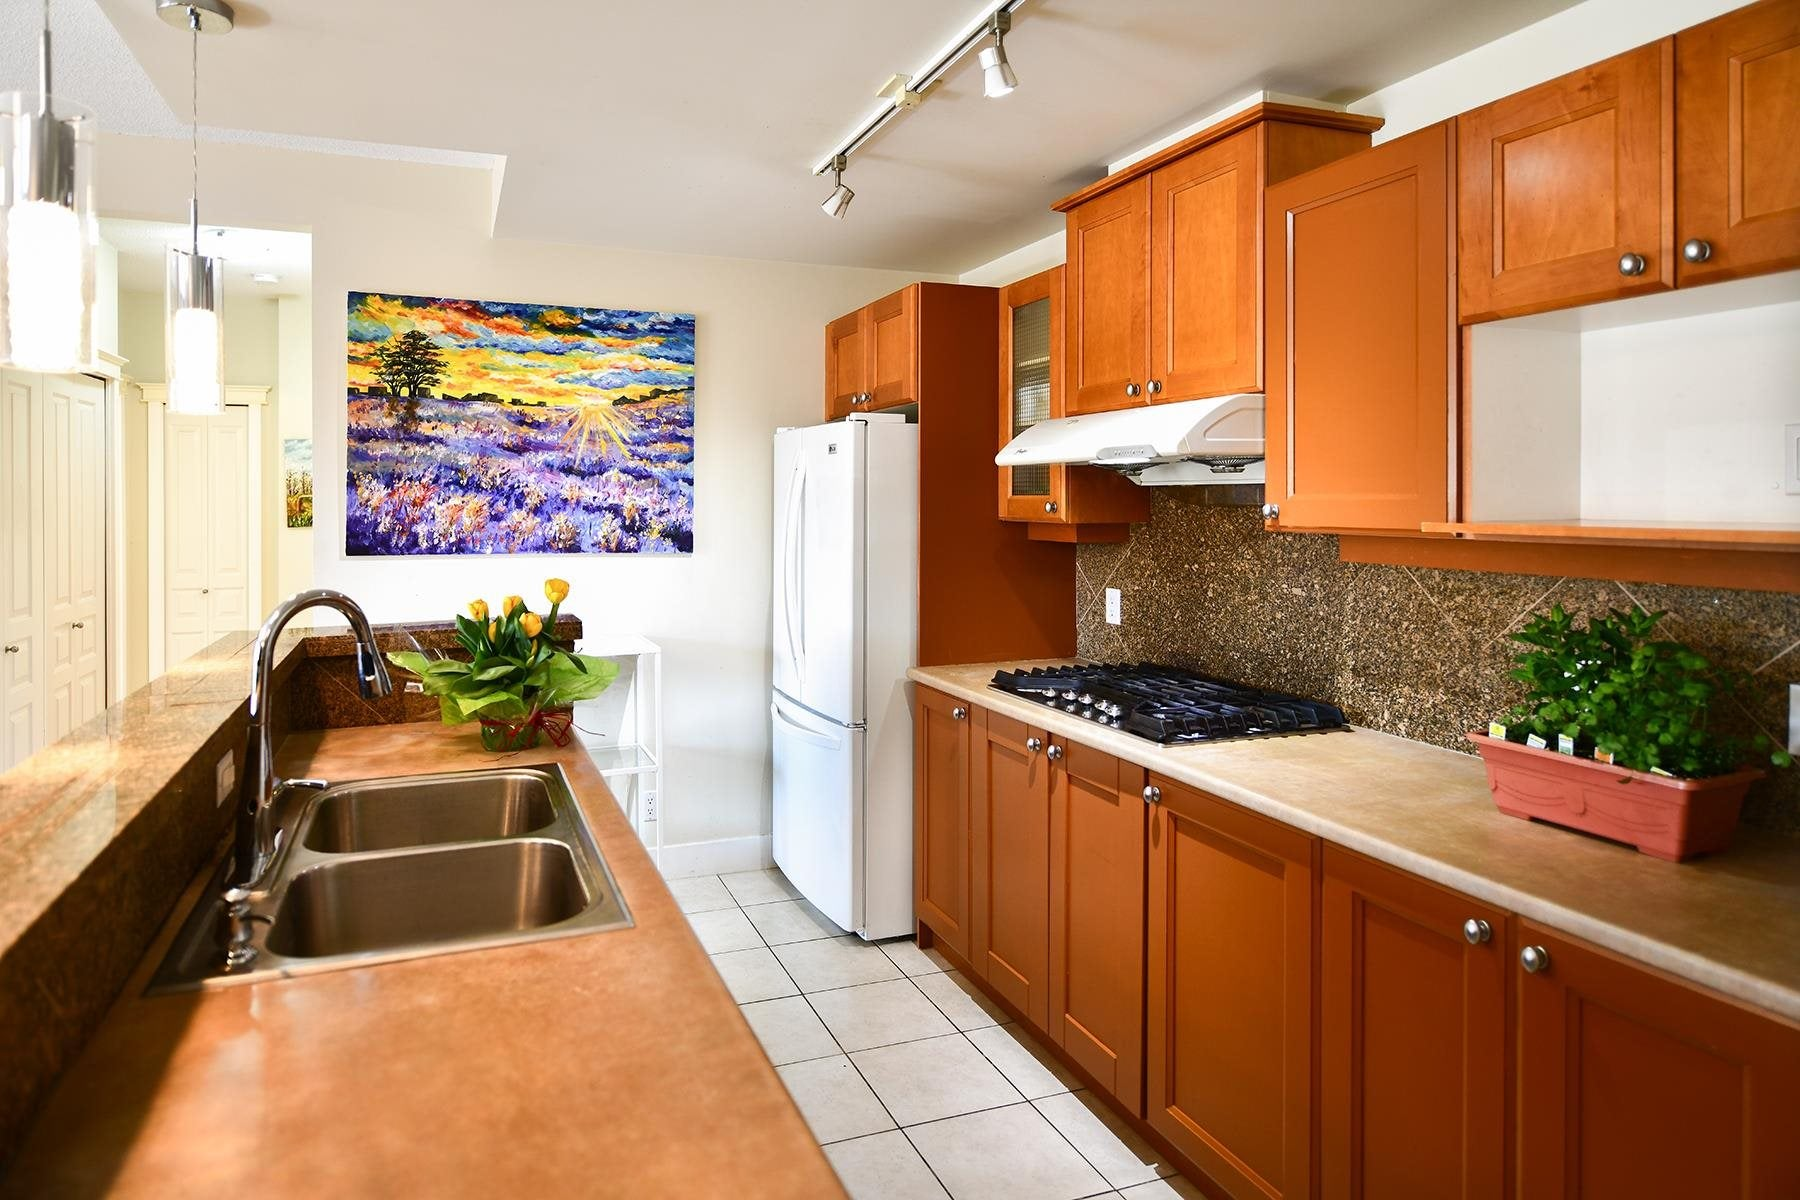 204 5790 EAST BOULEVARD - Kerrisdale Apartment/Condo for sale, 3 Bedrooms (R2604138) - #9